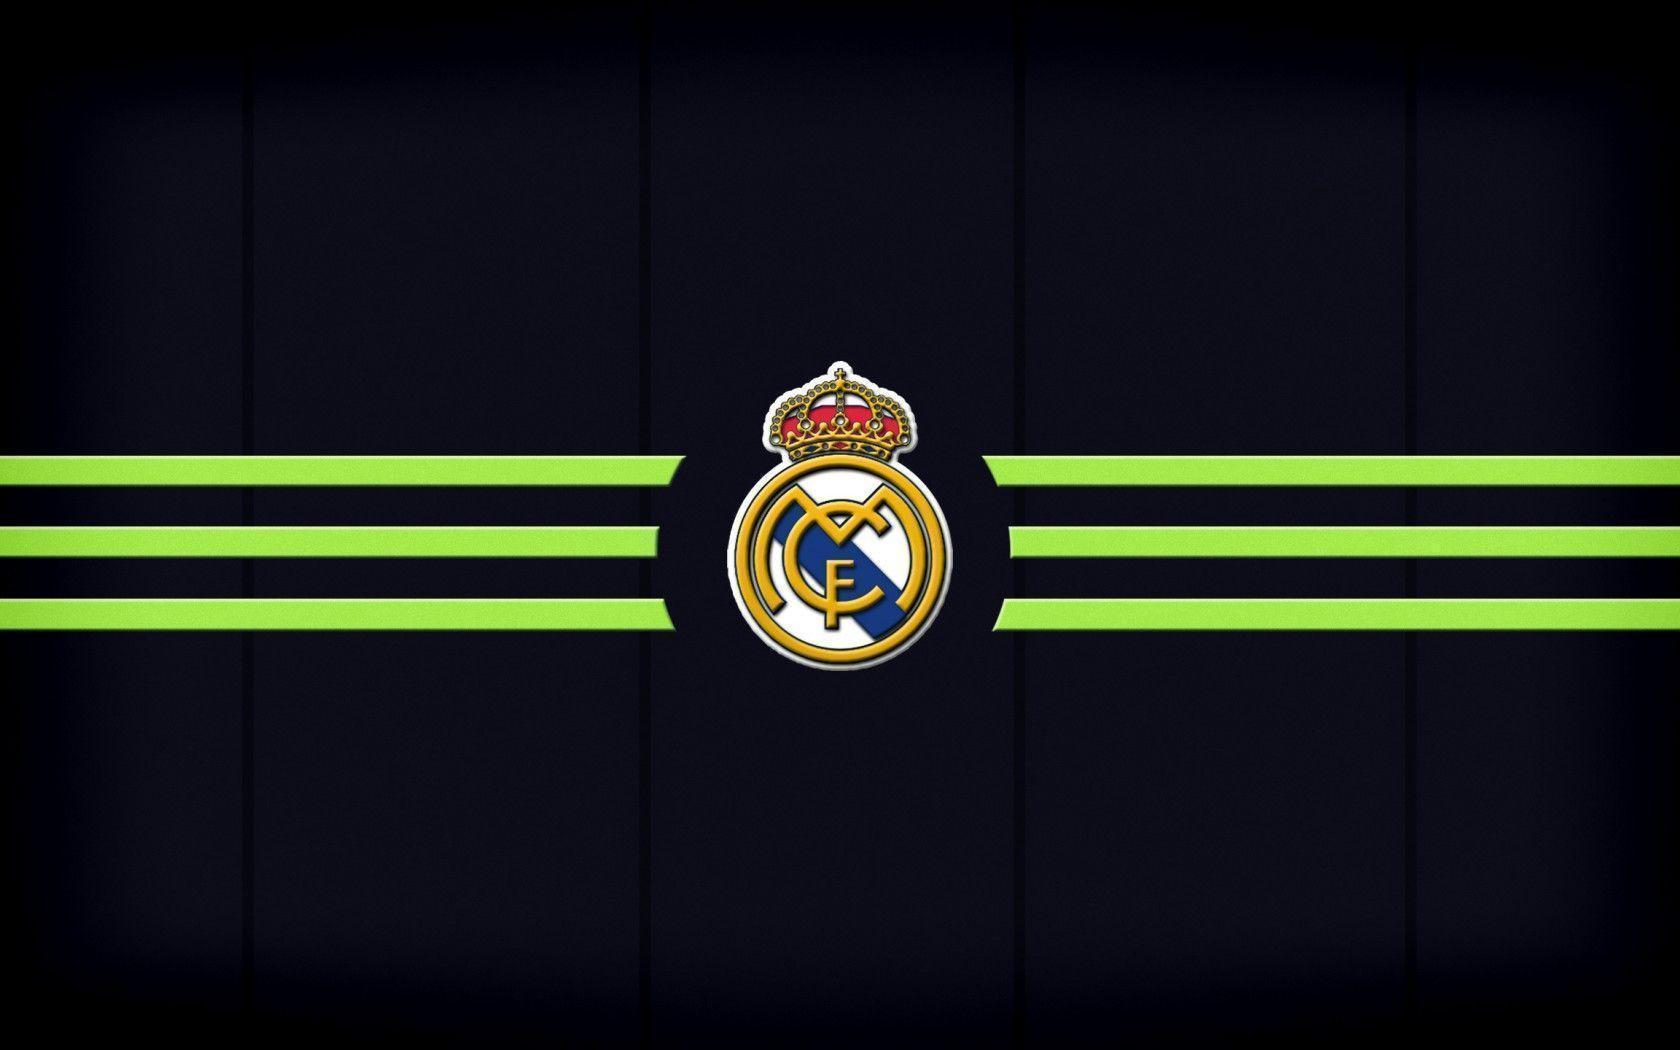 Real Madrid Logo Wallpapers Wallpaper Cave